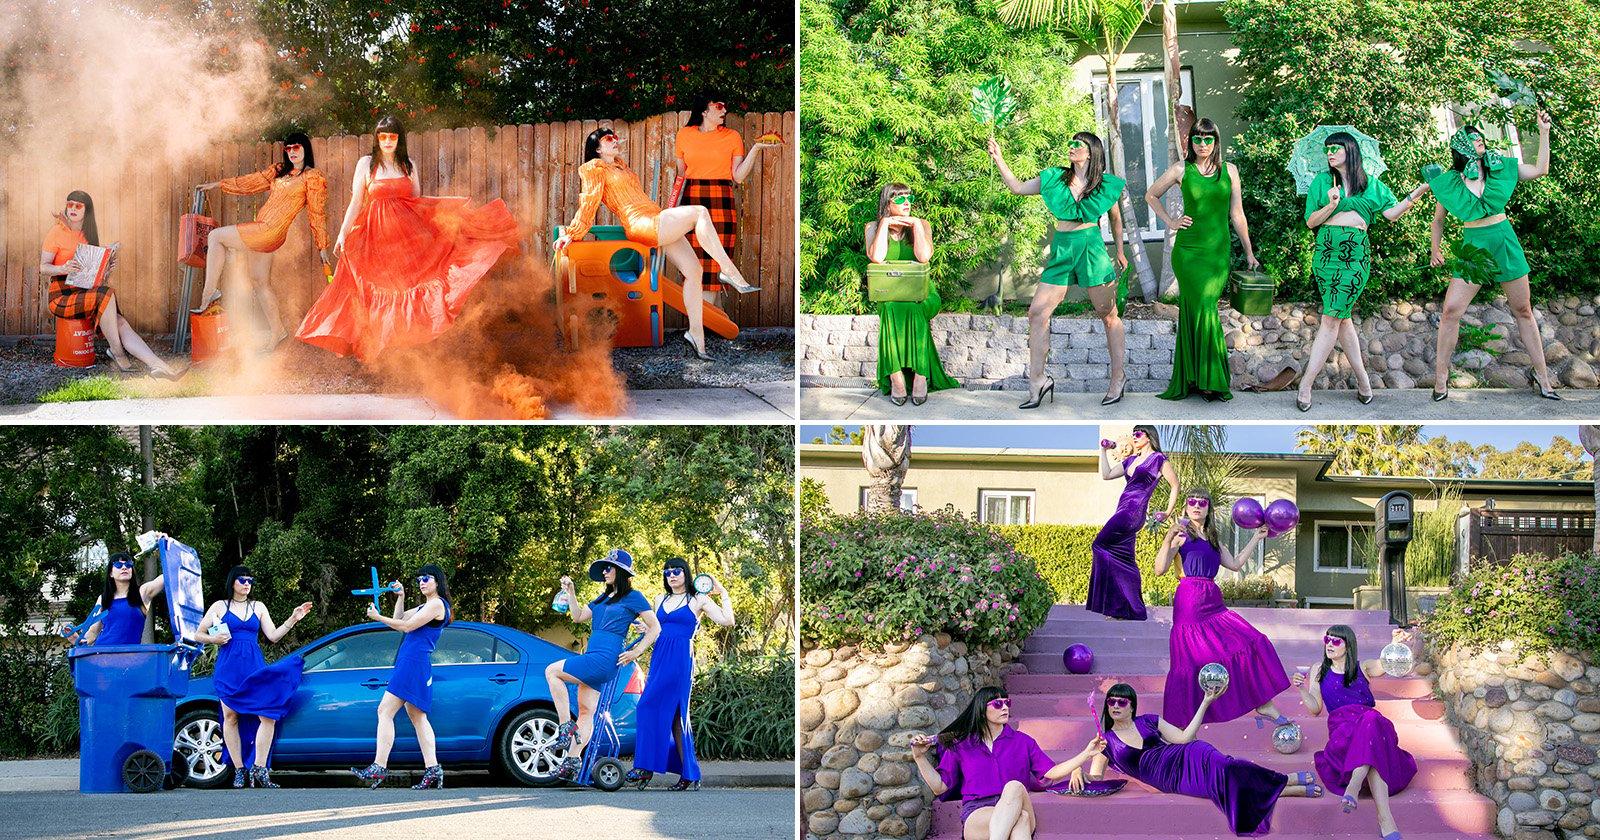 Photographer and Fashion Blogger Capture Colorful Quarantine Portraits